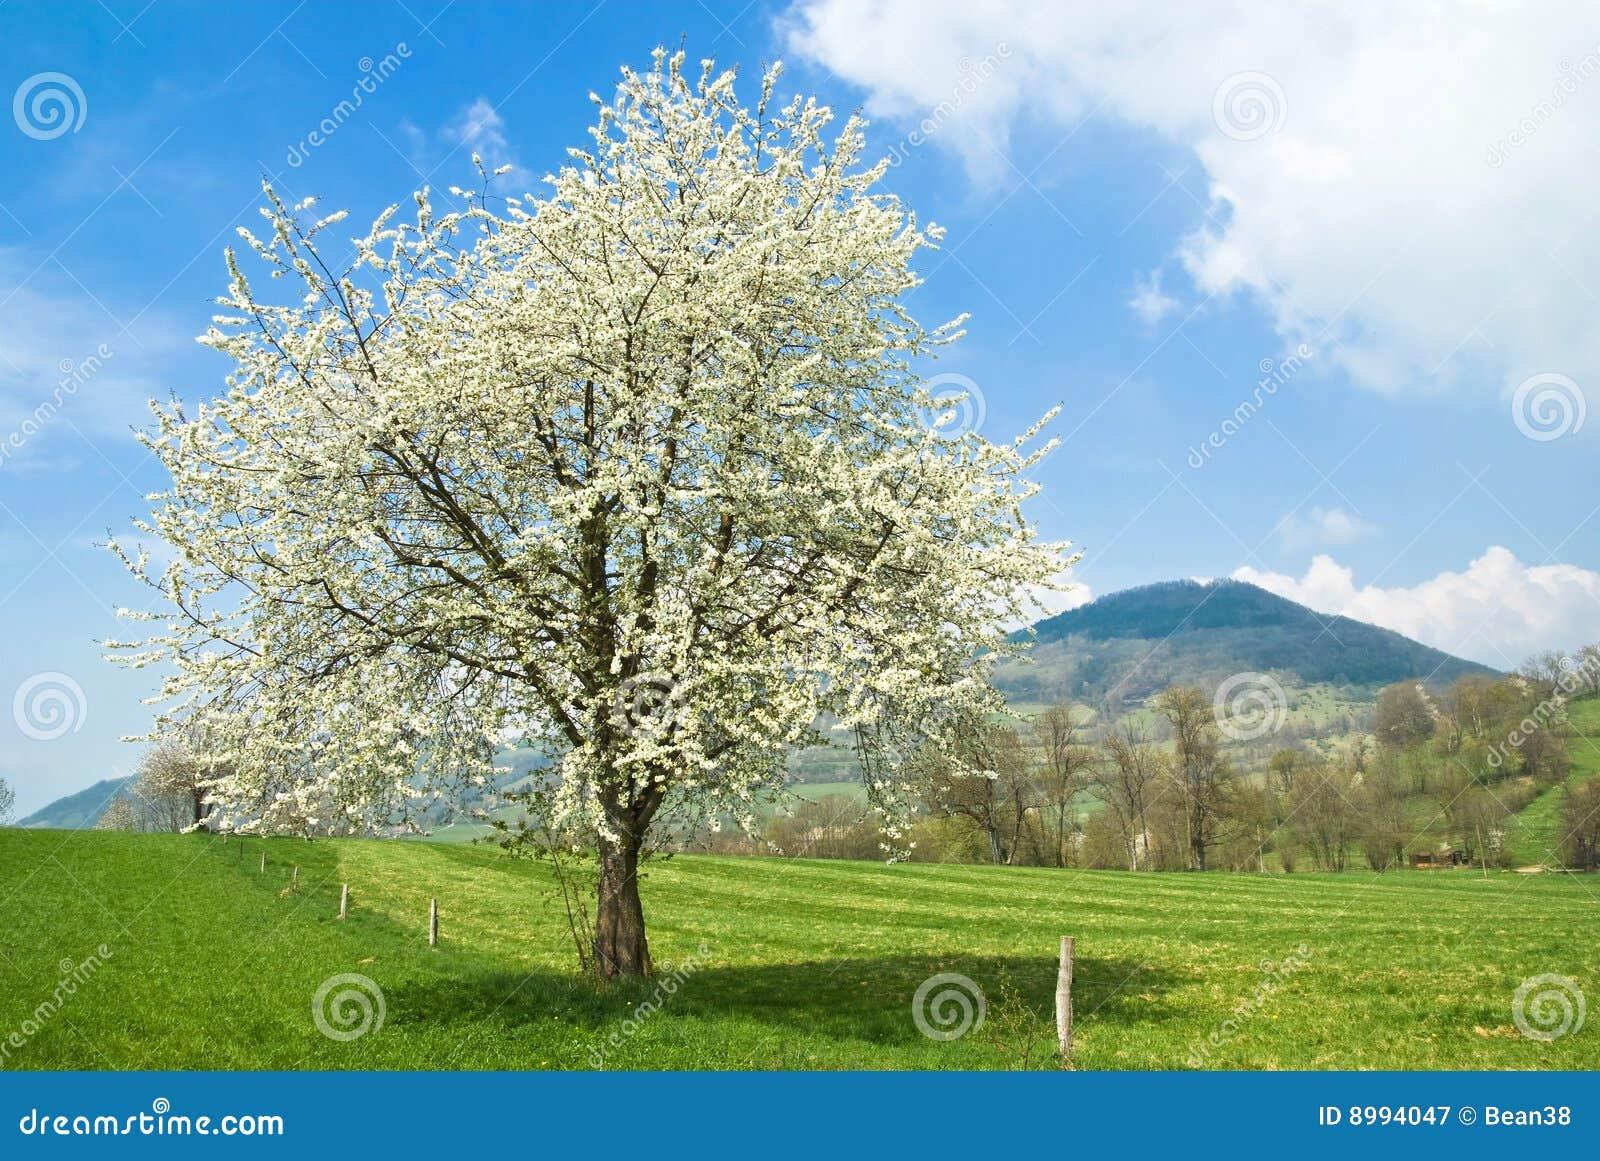 De lente in Frankrijk